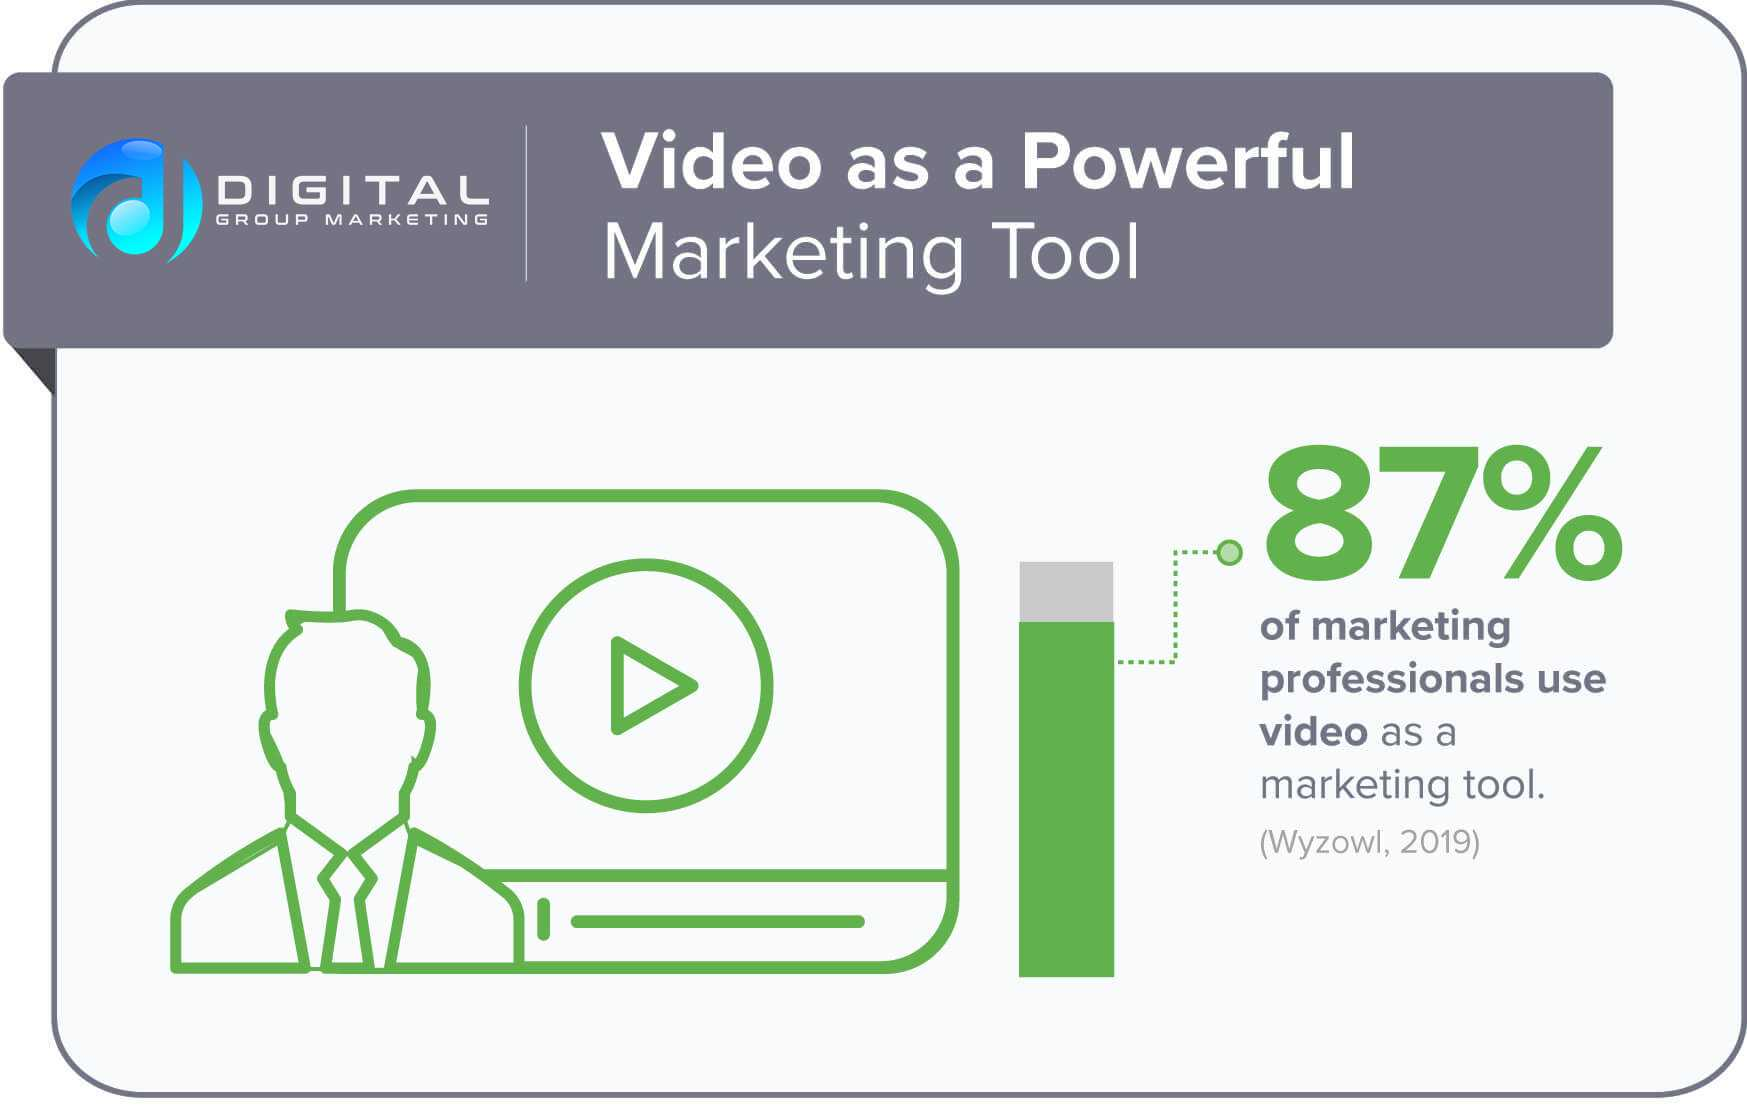 video as powerful marketing tool